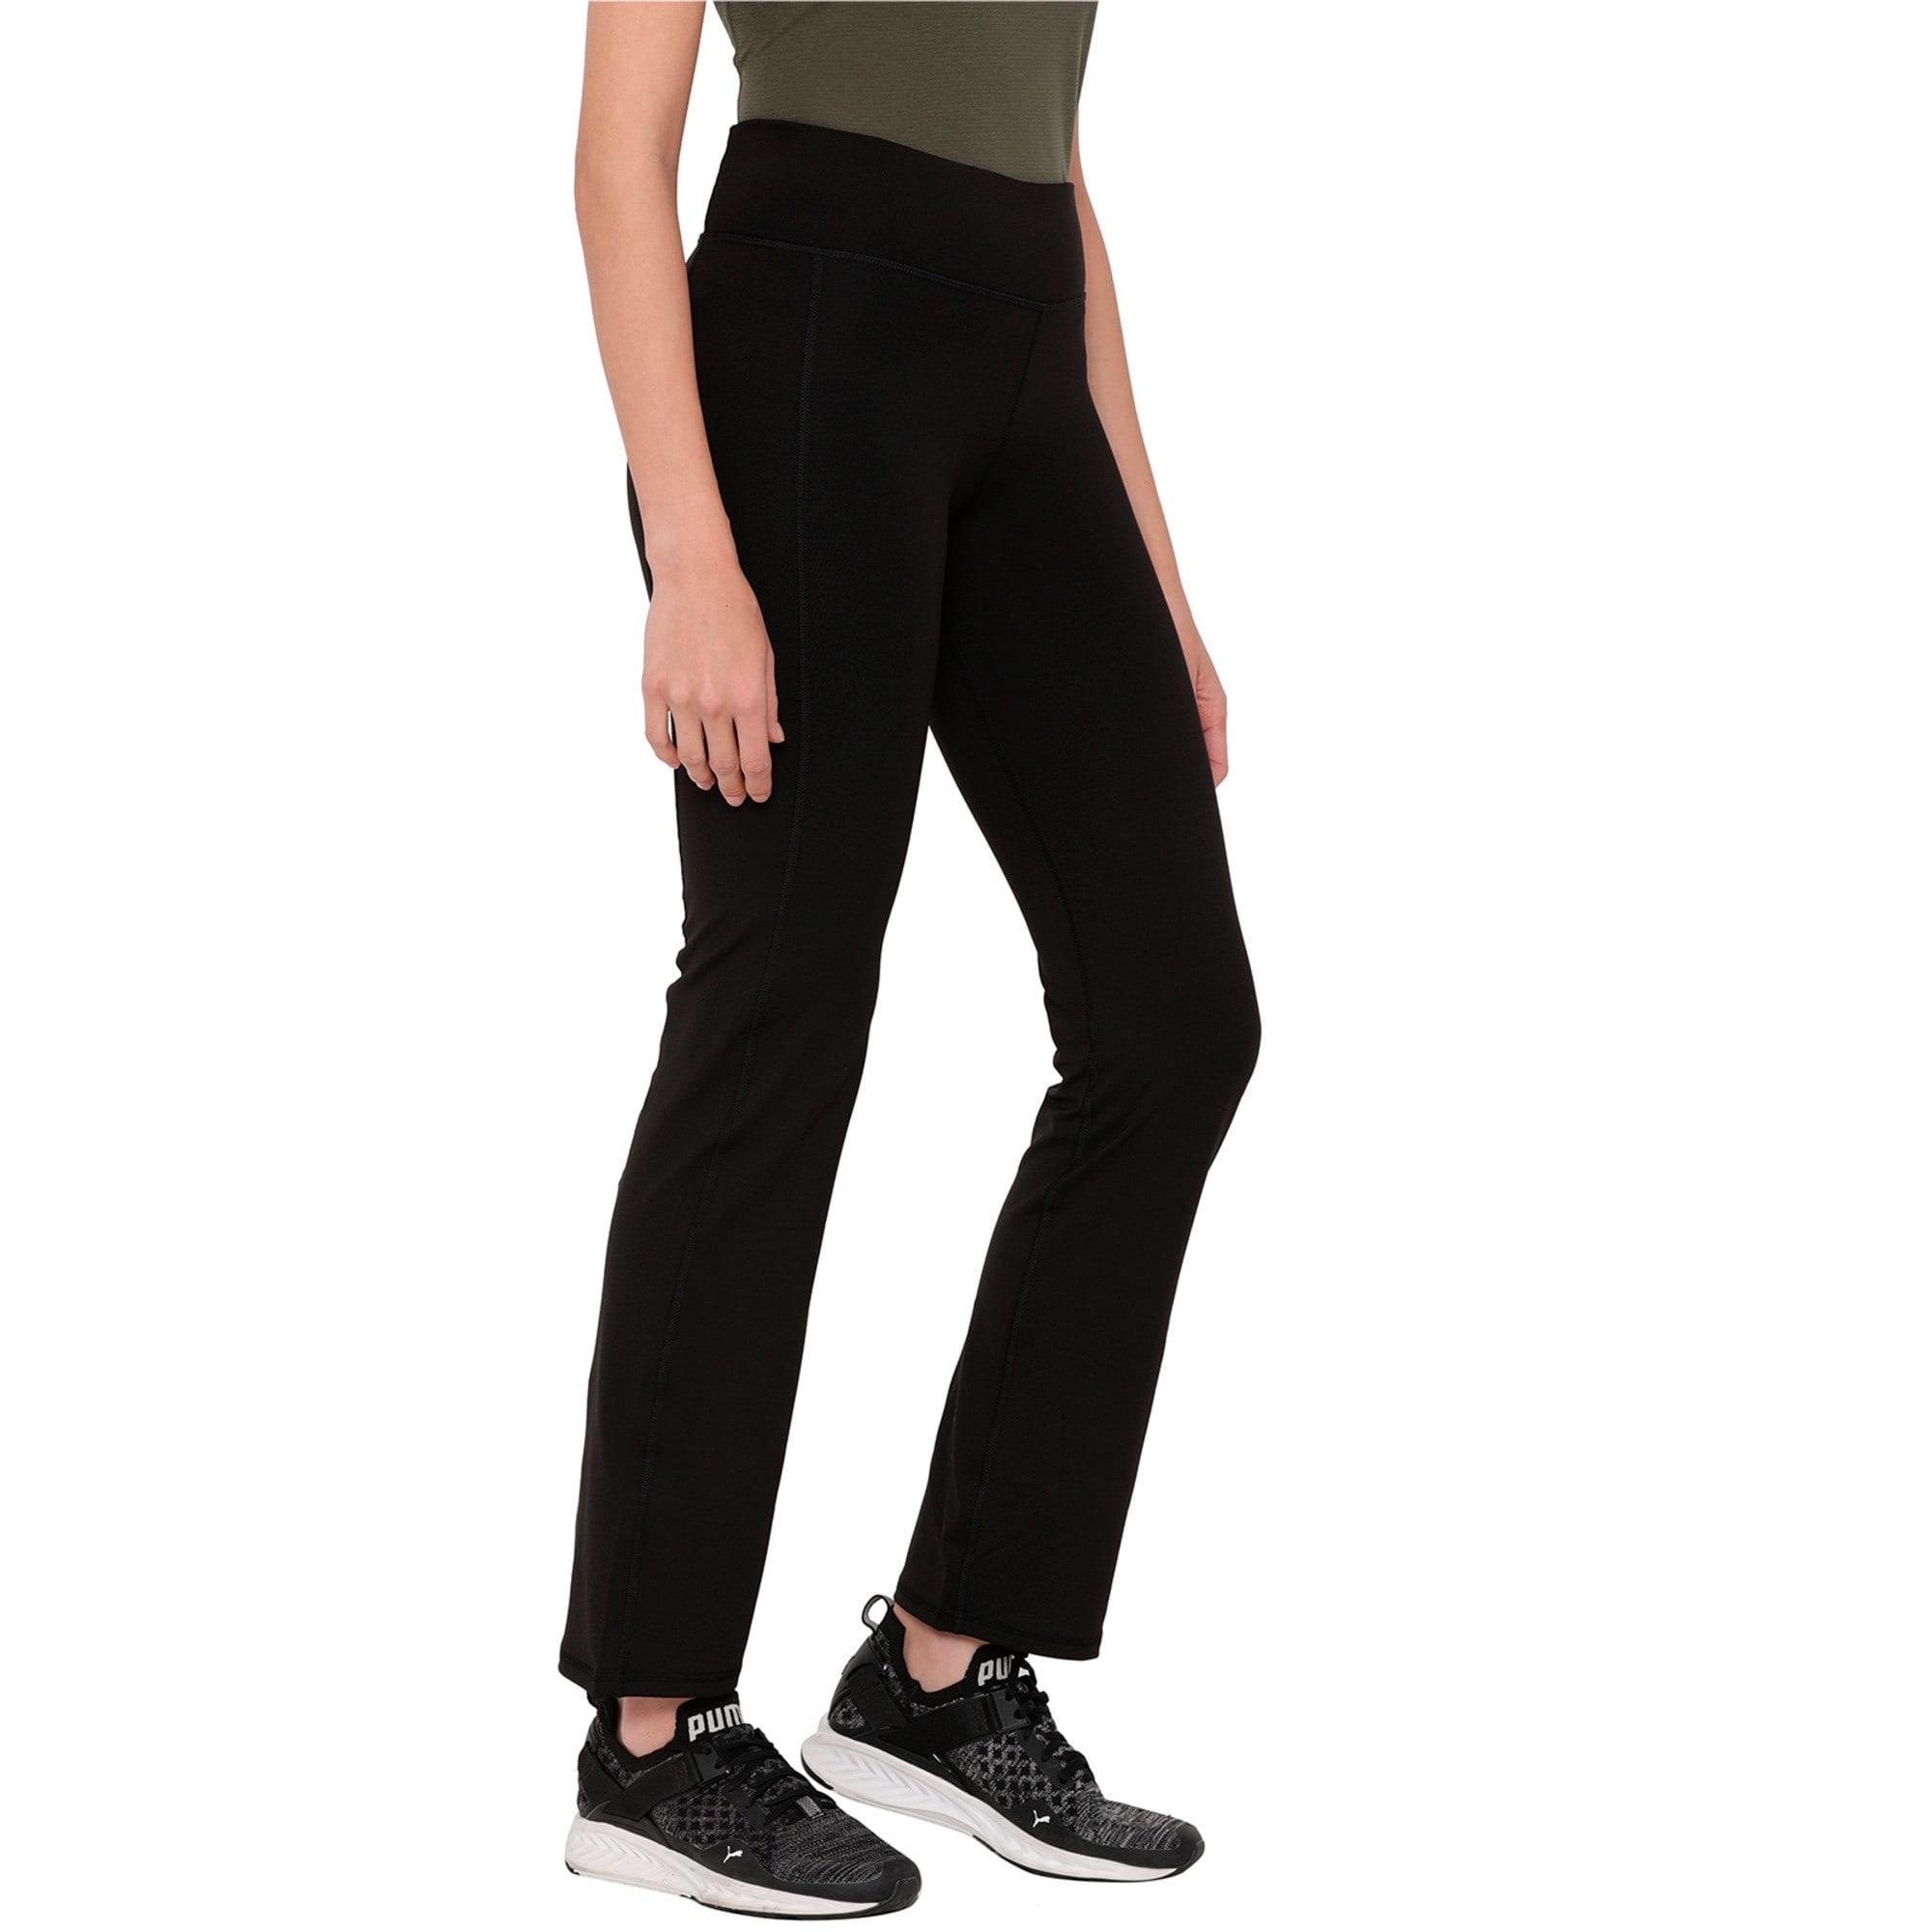 Thumbnail 2 of Essential Straight Leg, Puma Black, medium-IND